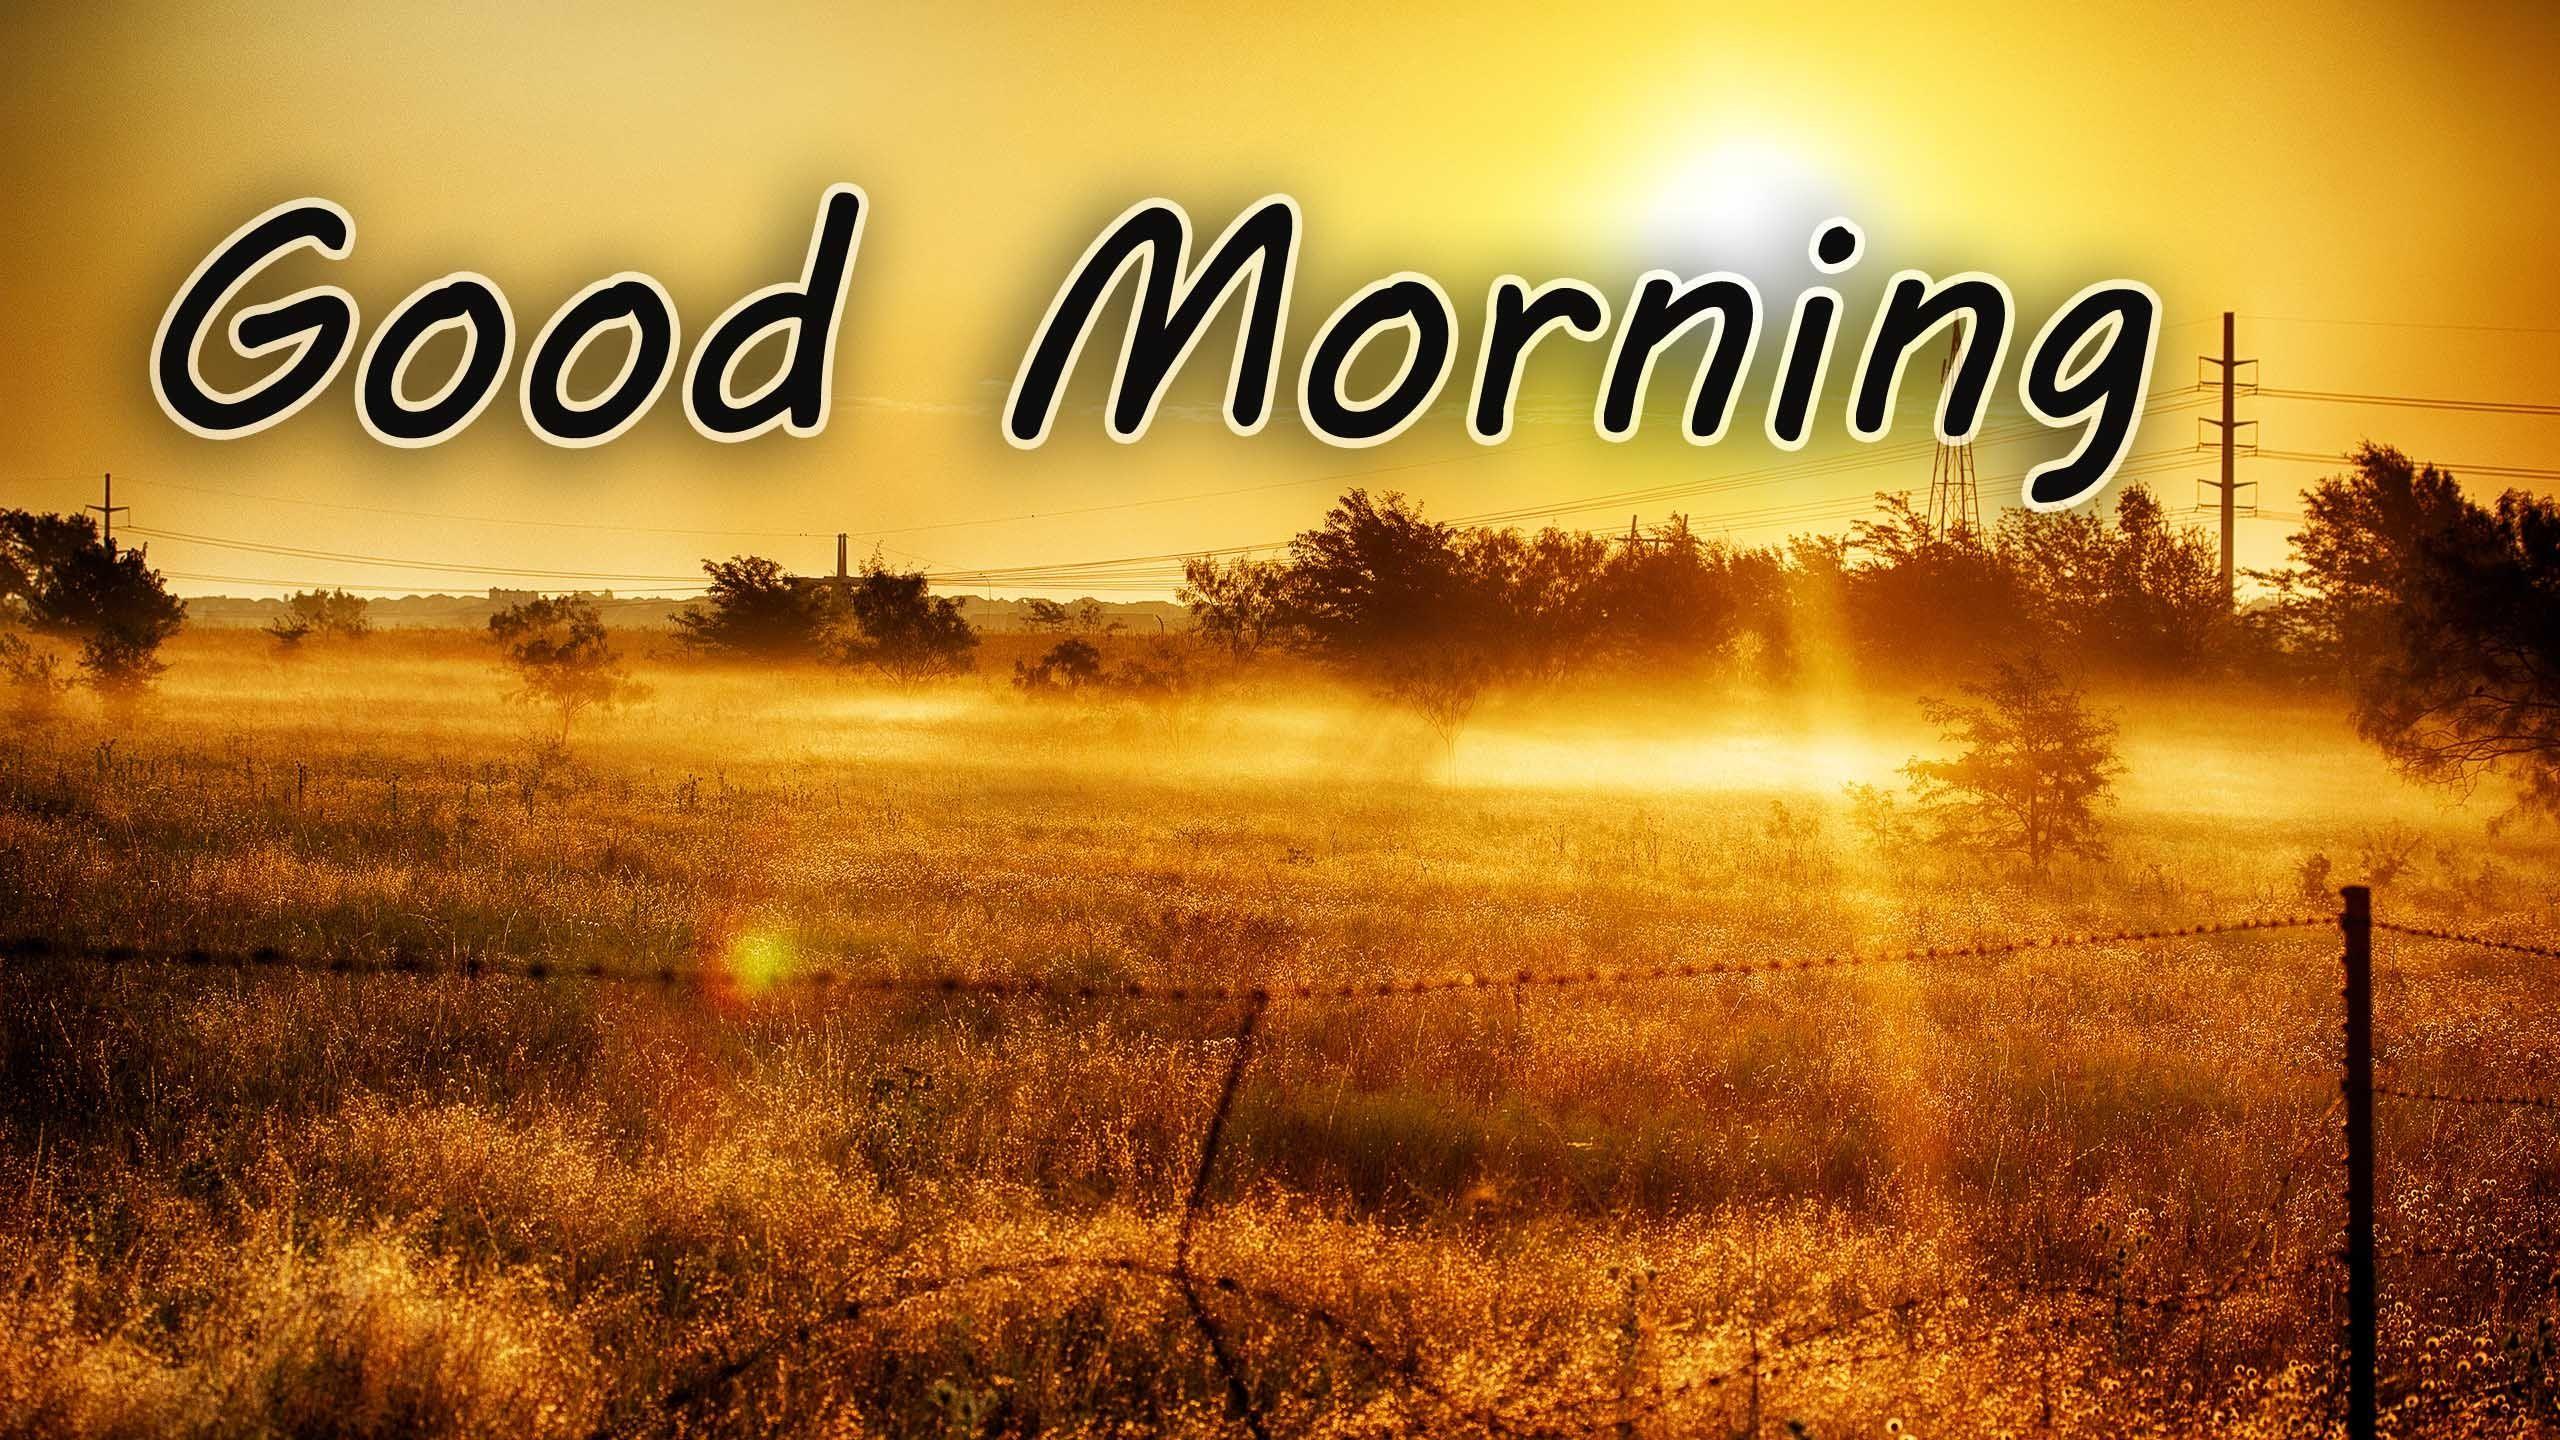 Good Morning Sunrise Memes Meme Sunshine Good Morning Cool Images Sunday Mornings Morning Images Sunrise Images Sunrise Pictures Sunrise Wallpaper